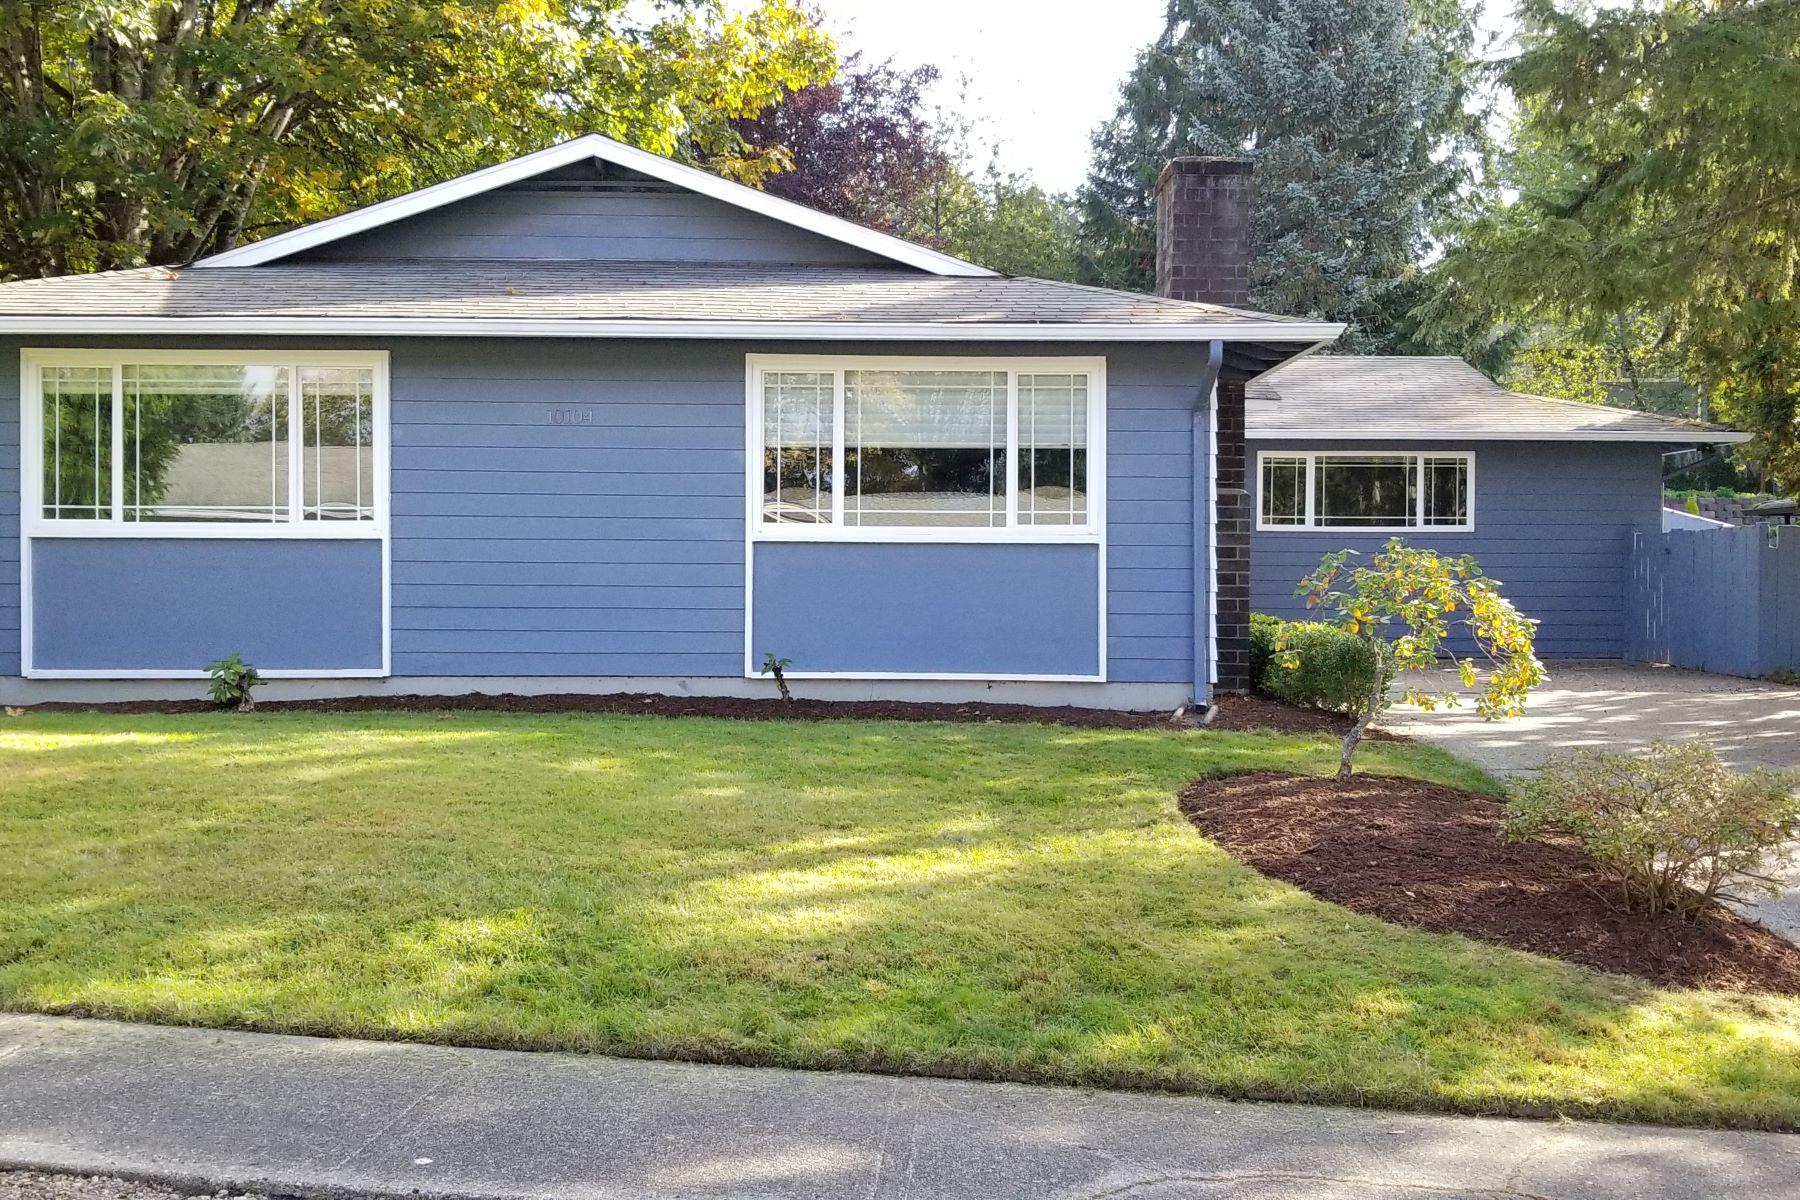 Single Family Homes for Sale at Stoner 10104 162nd Place NE Redmond, Washington 98052 United States